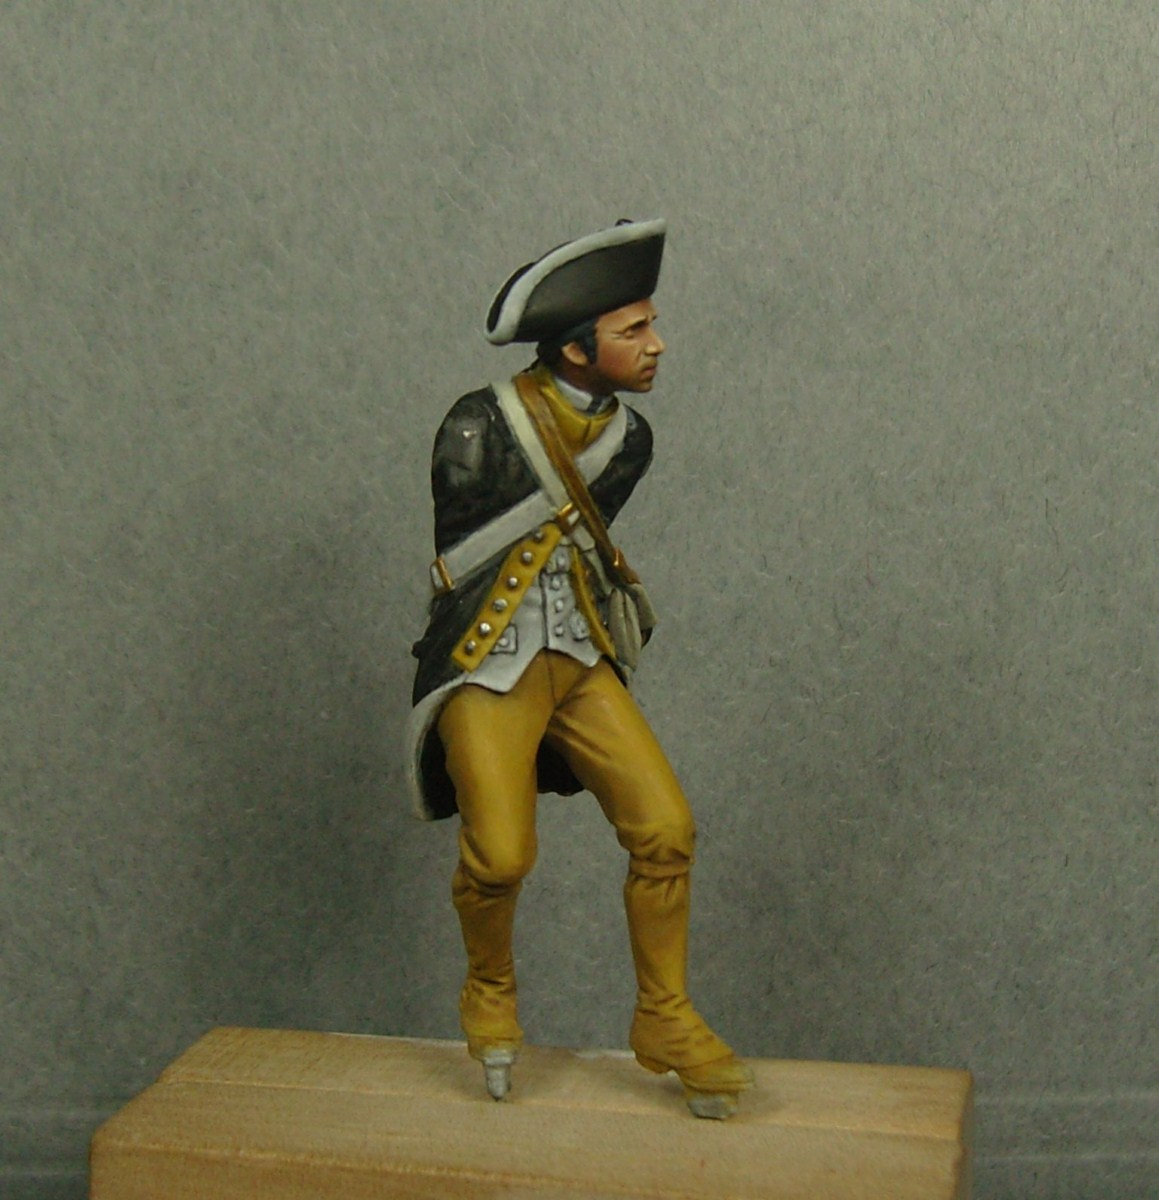 US Revolutionary Infantryman, 1780 - Page 7 120217034501699799450805